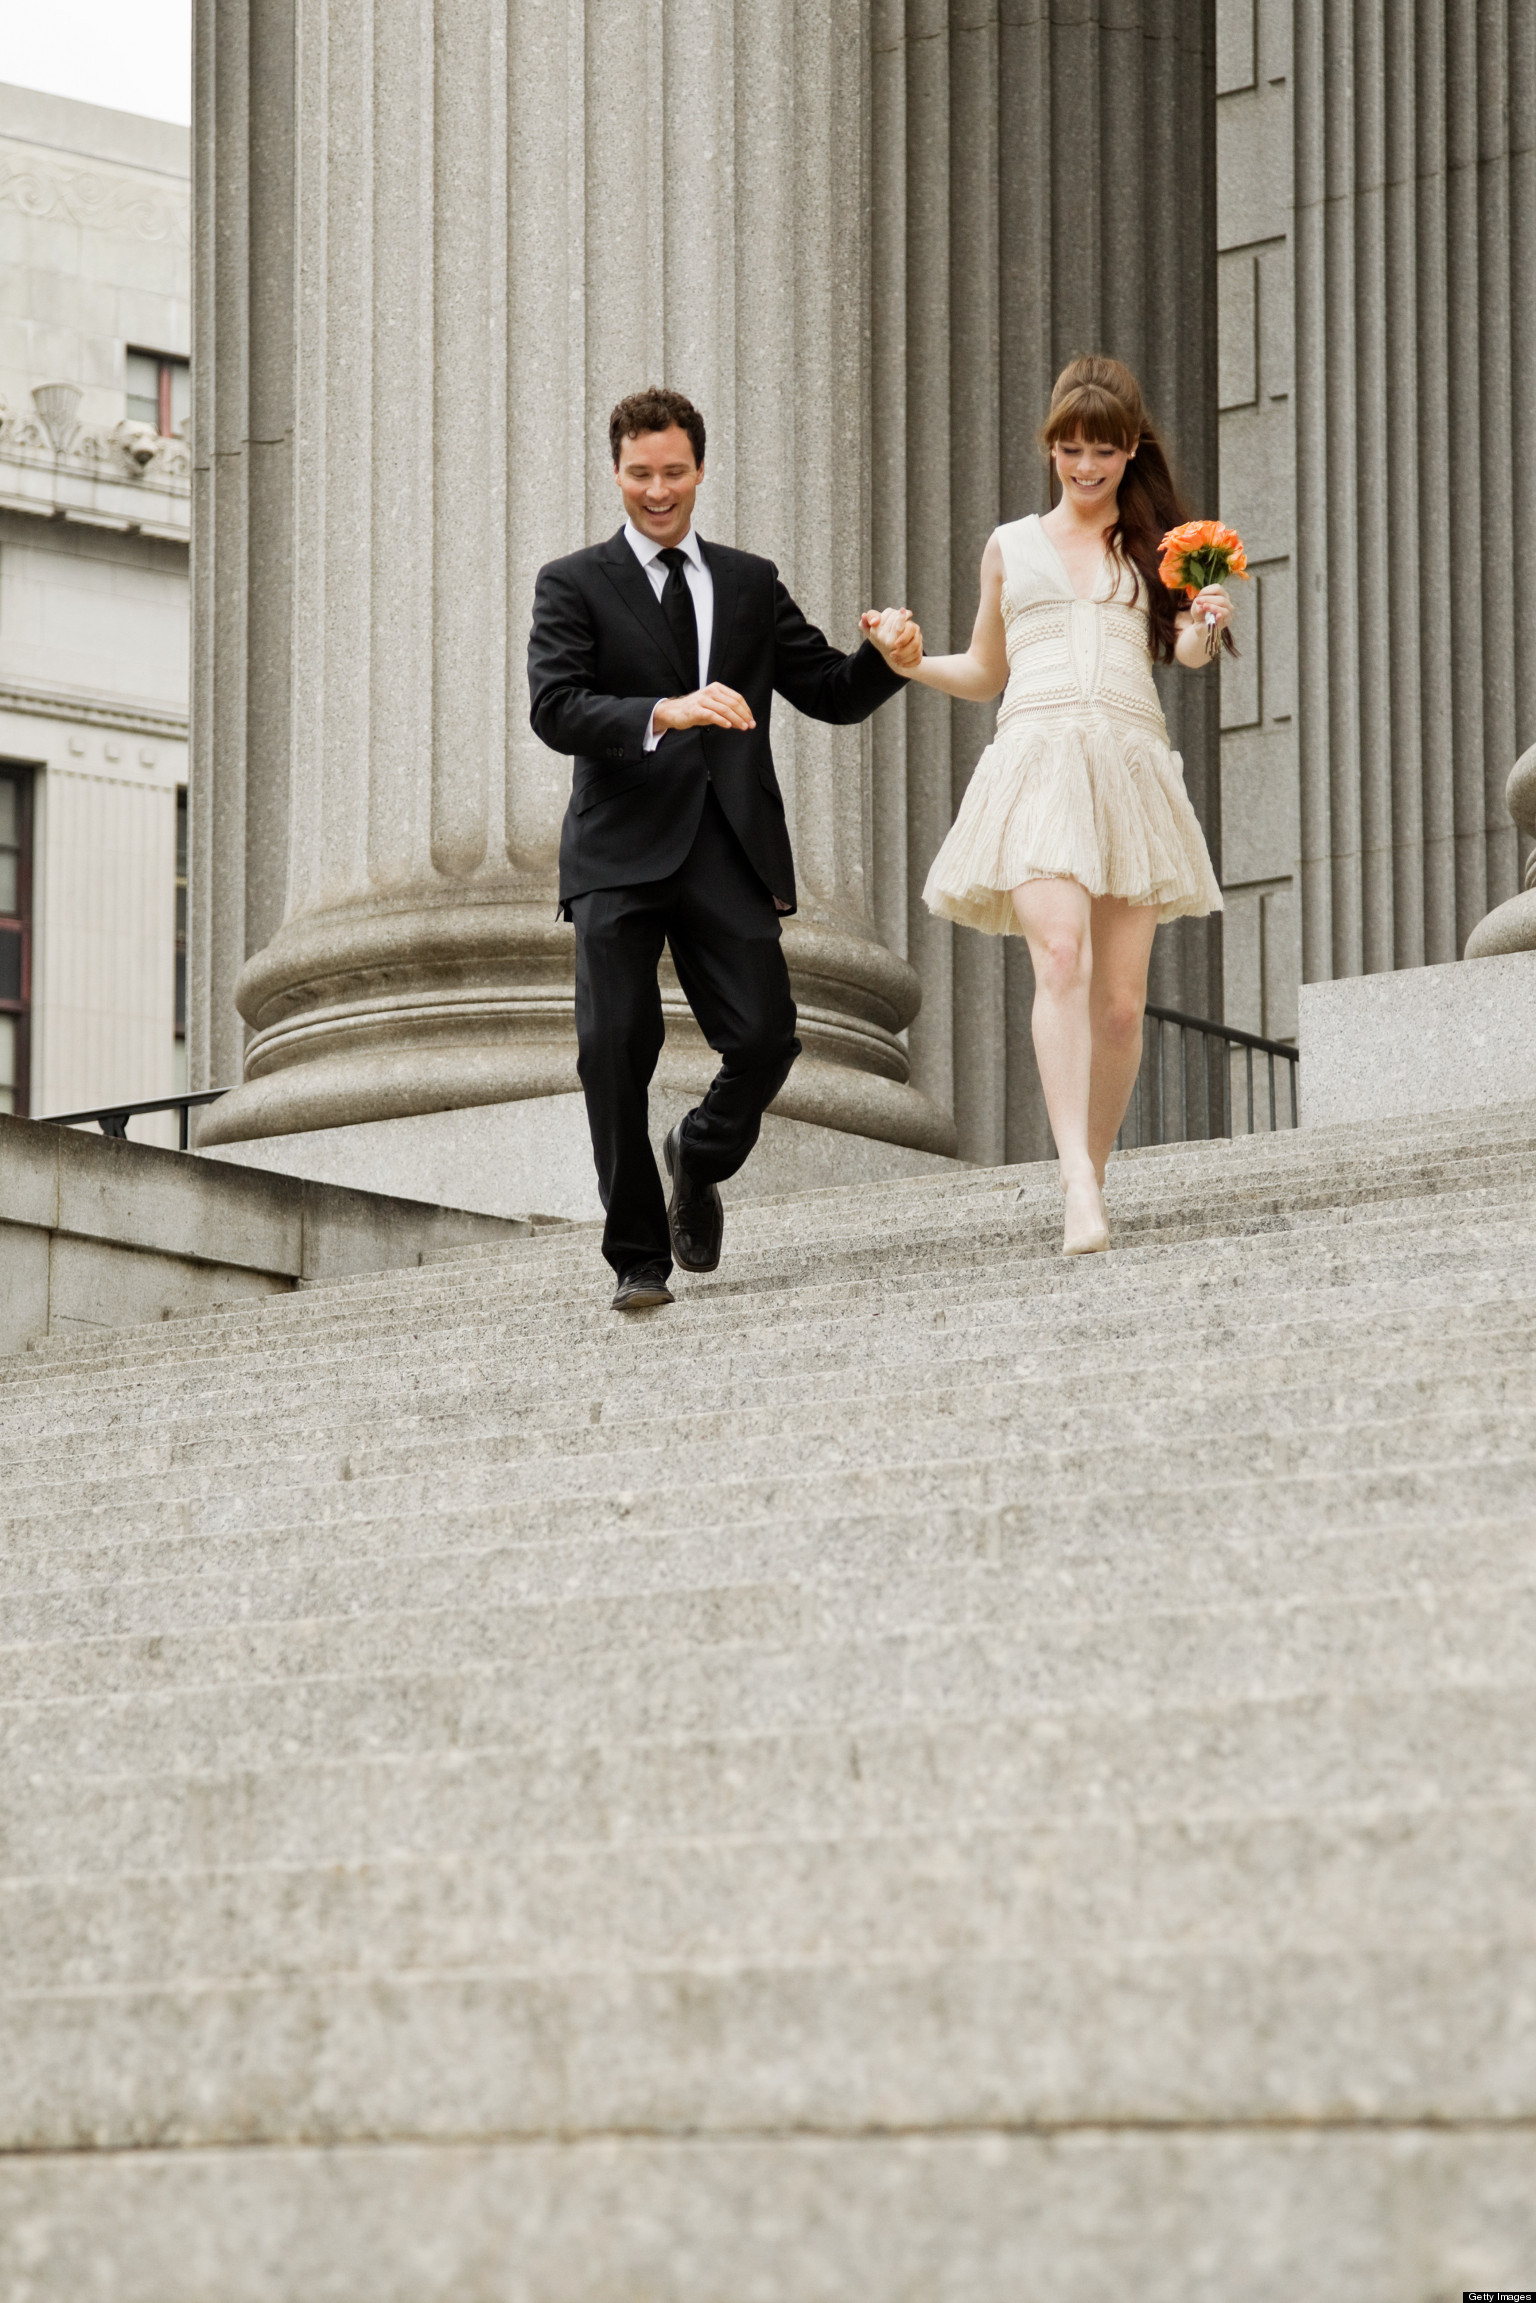 11 Wedding Dresses To Wear To A City Hall Wedding | HuffPost